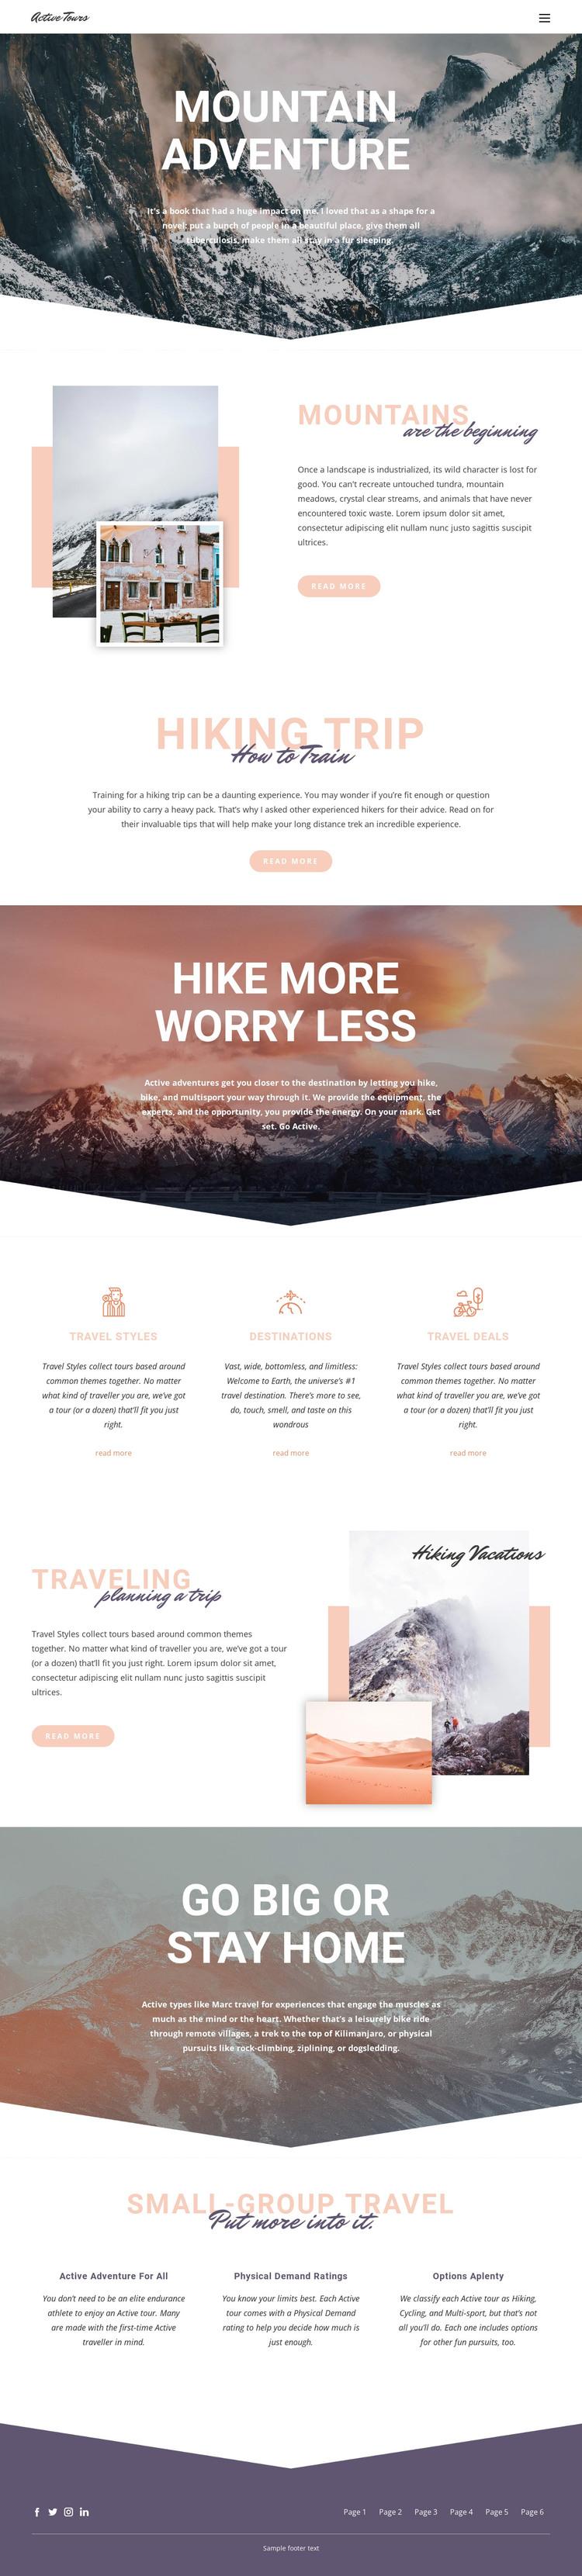 Mountain Adventure Web Design